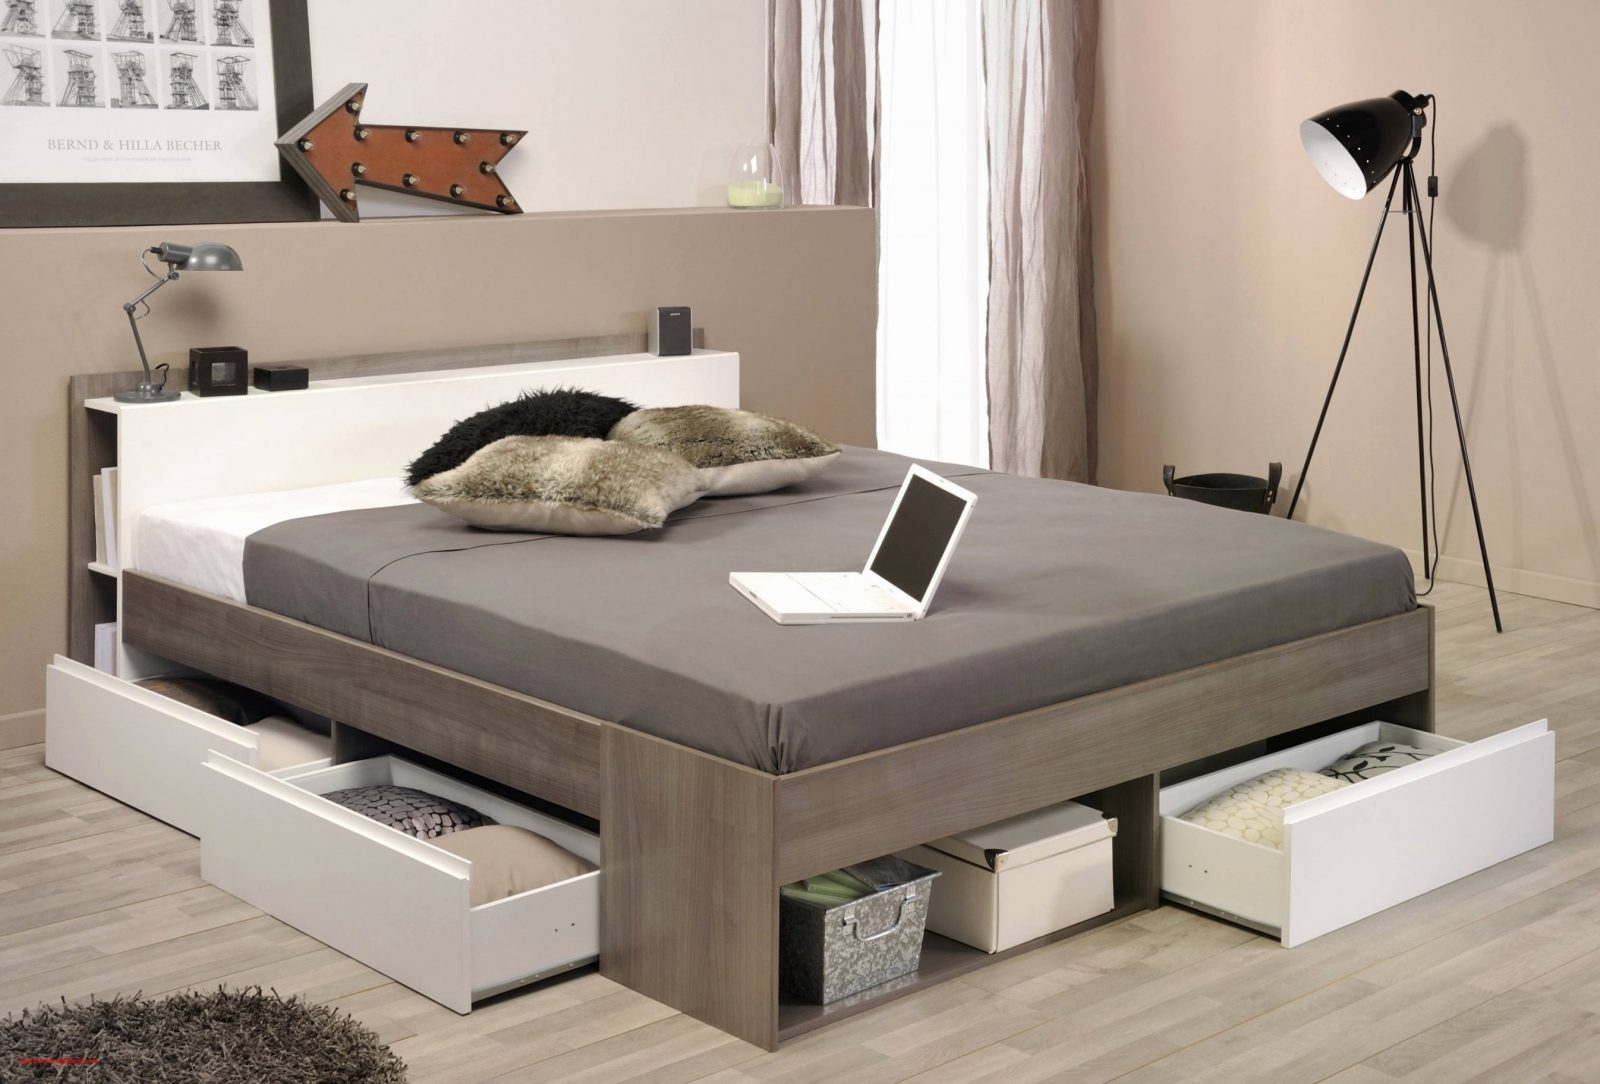 Vintage Bett Neu Wohnideen Bett Selber Bauen Kreativ Mit Schön Bett von Bett Selber Bauen Kreativ Photo